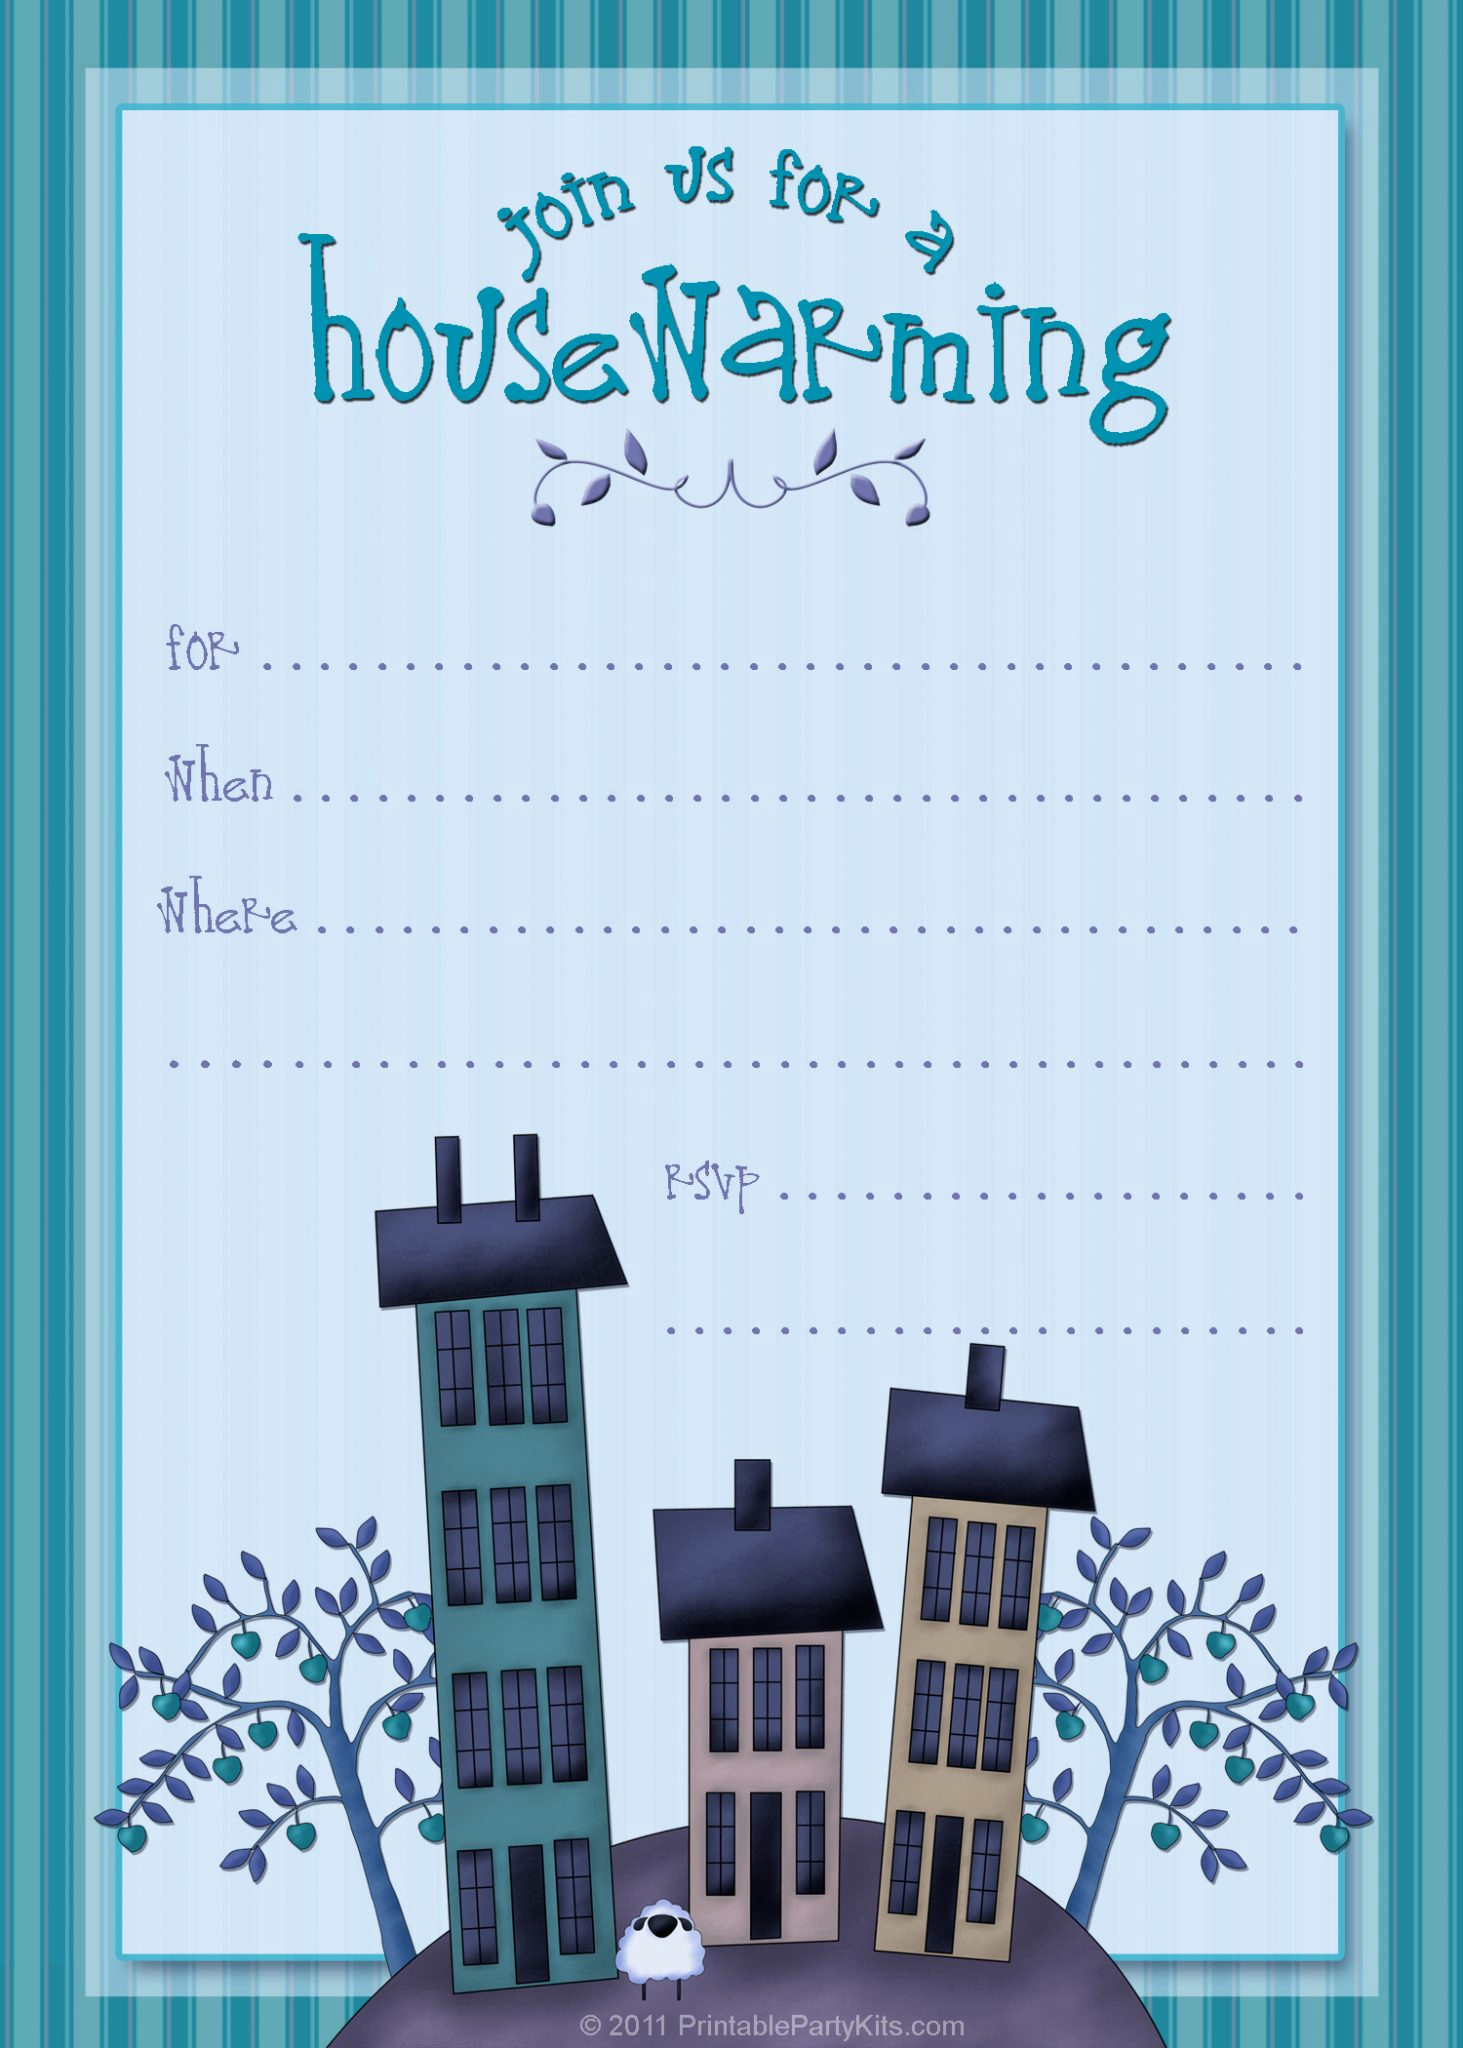 Housewarming Invitation Template Free Awesome Free Printable Housewarming Party Invitations Printable